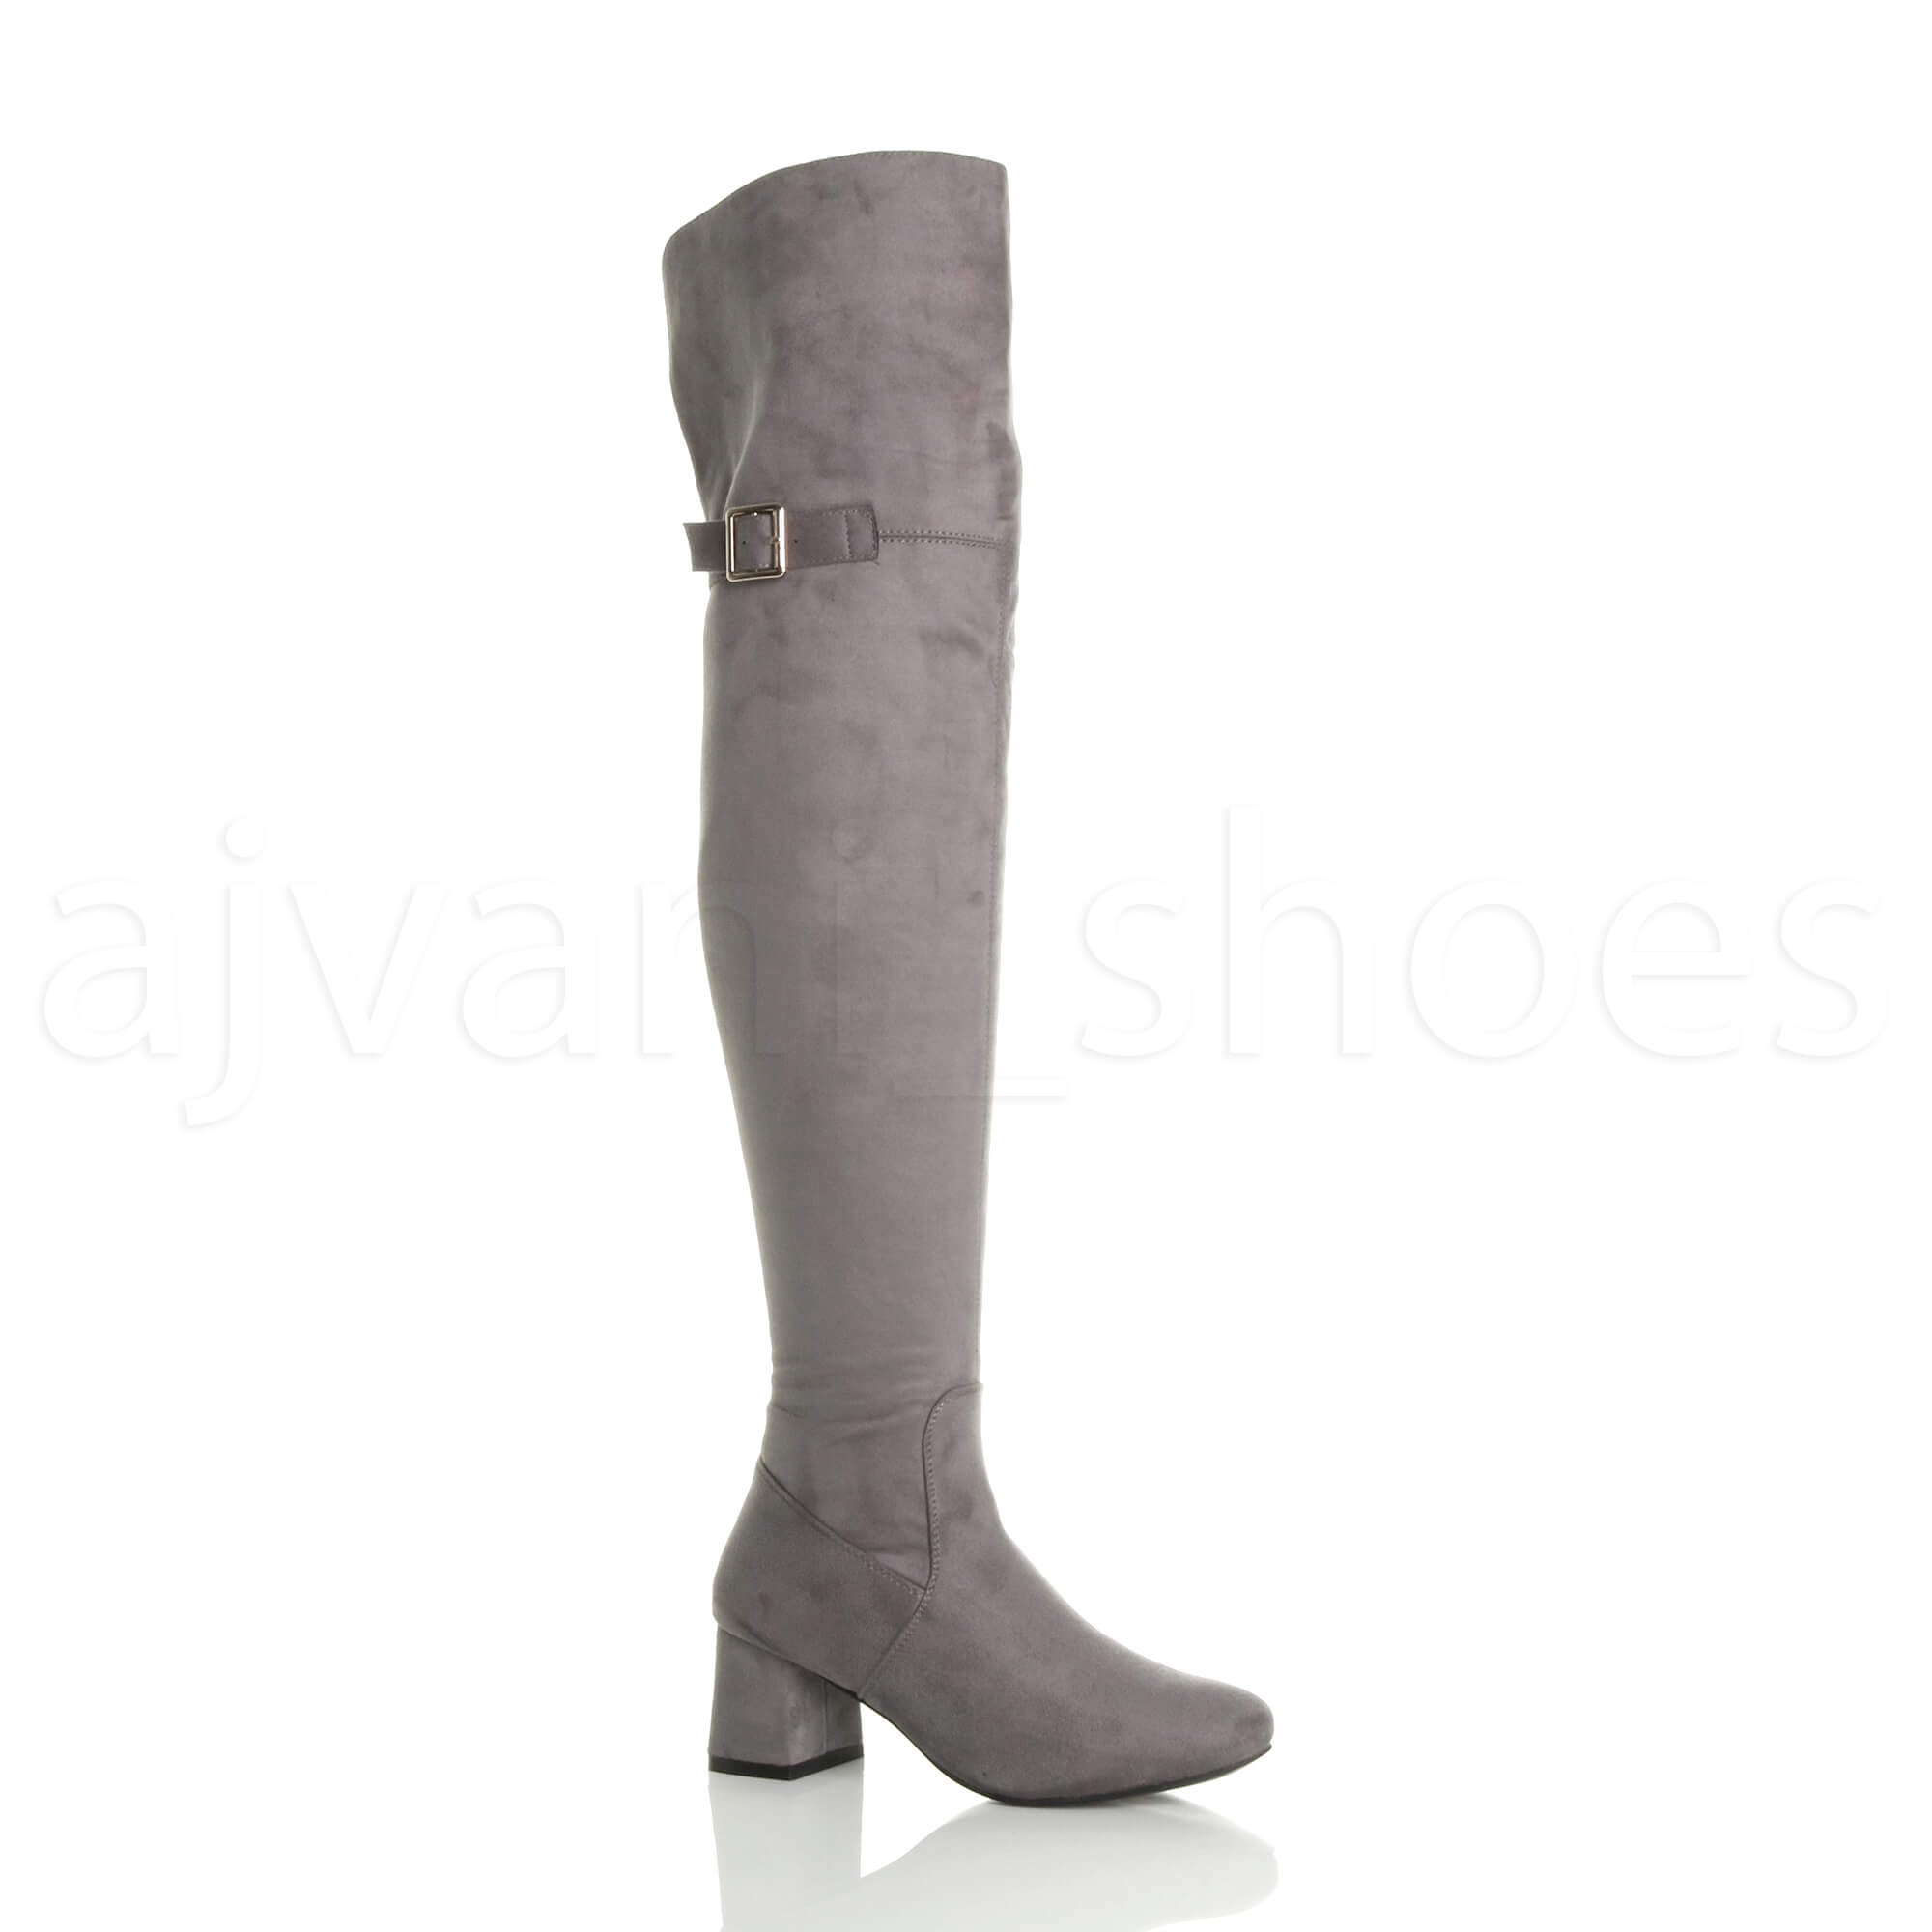 WOMENS-LADIES-BLOCK-MID-HEEL-ZIP-BUCKLE-FOLD-OVER-CUFF-OVER-THE-KNEE-HIGH-BOOTS